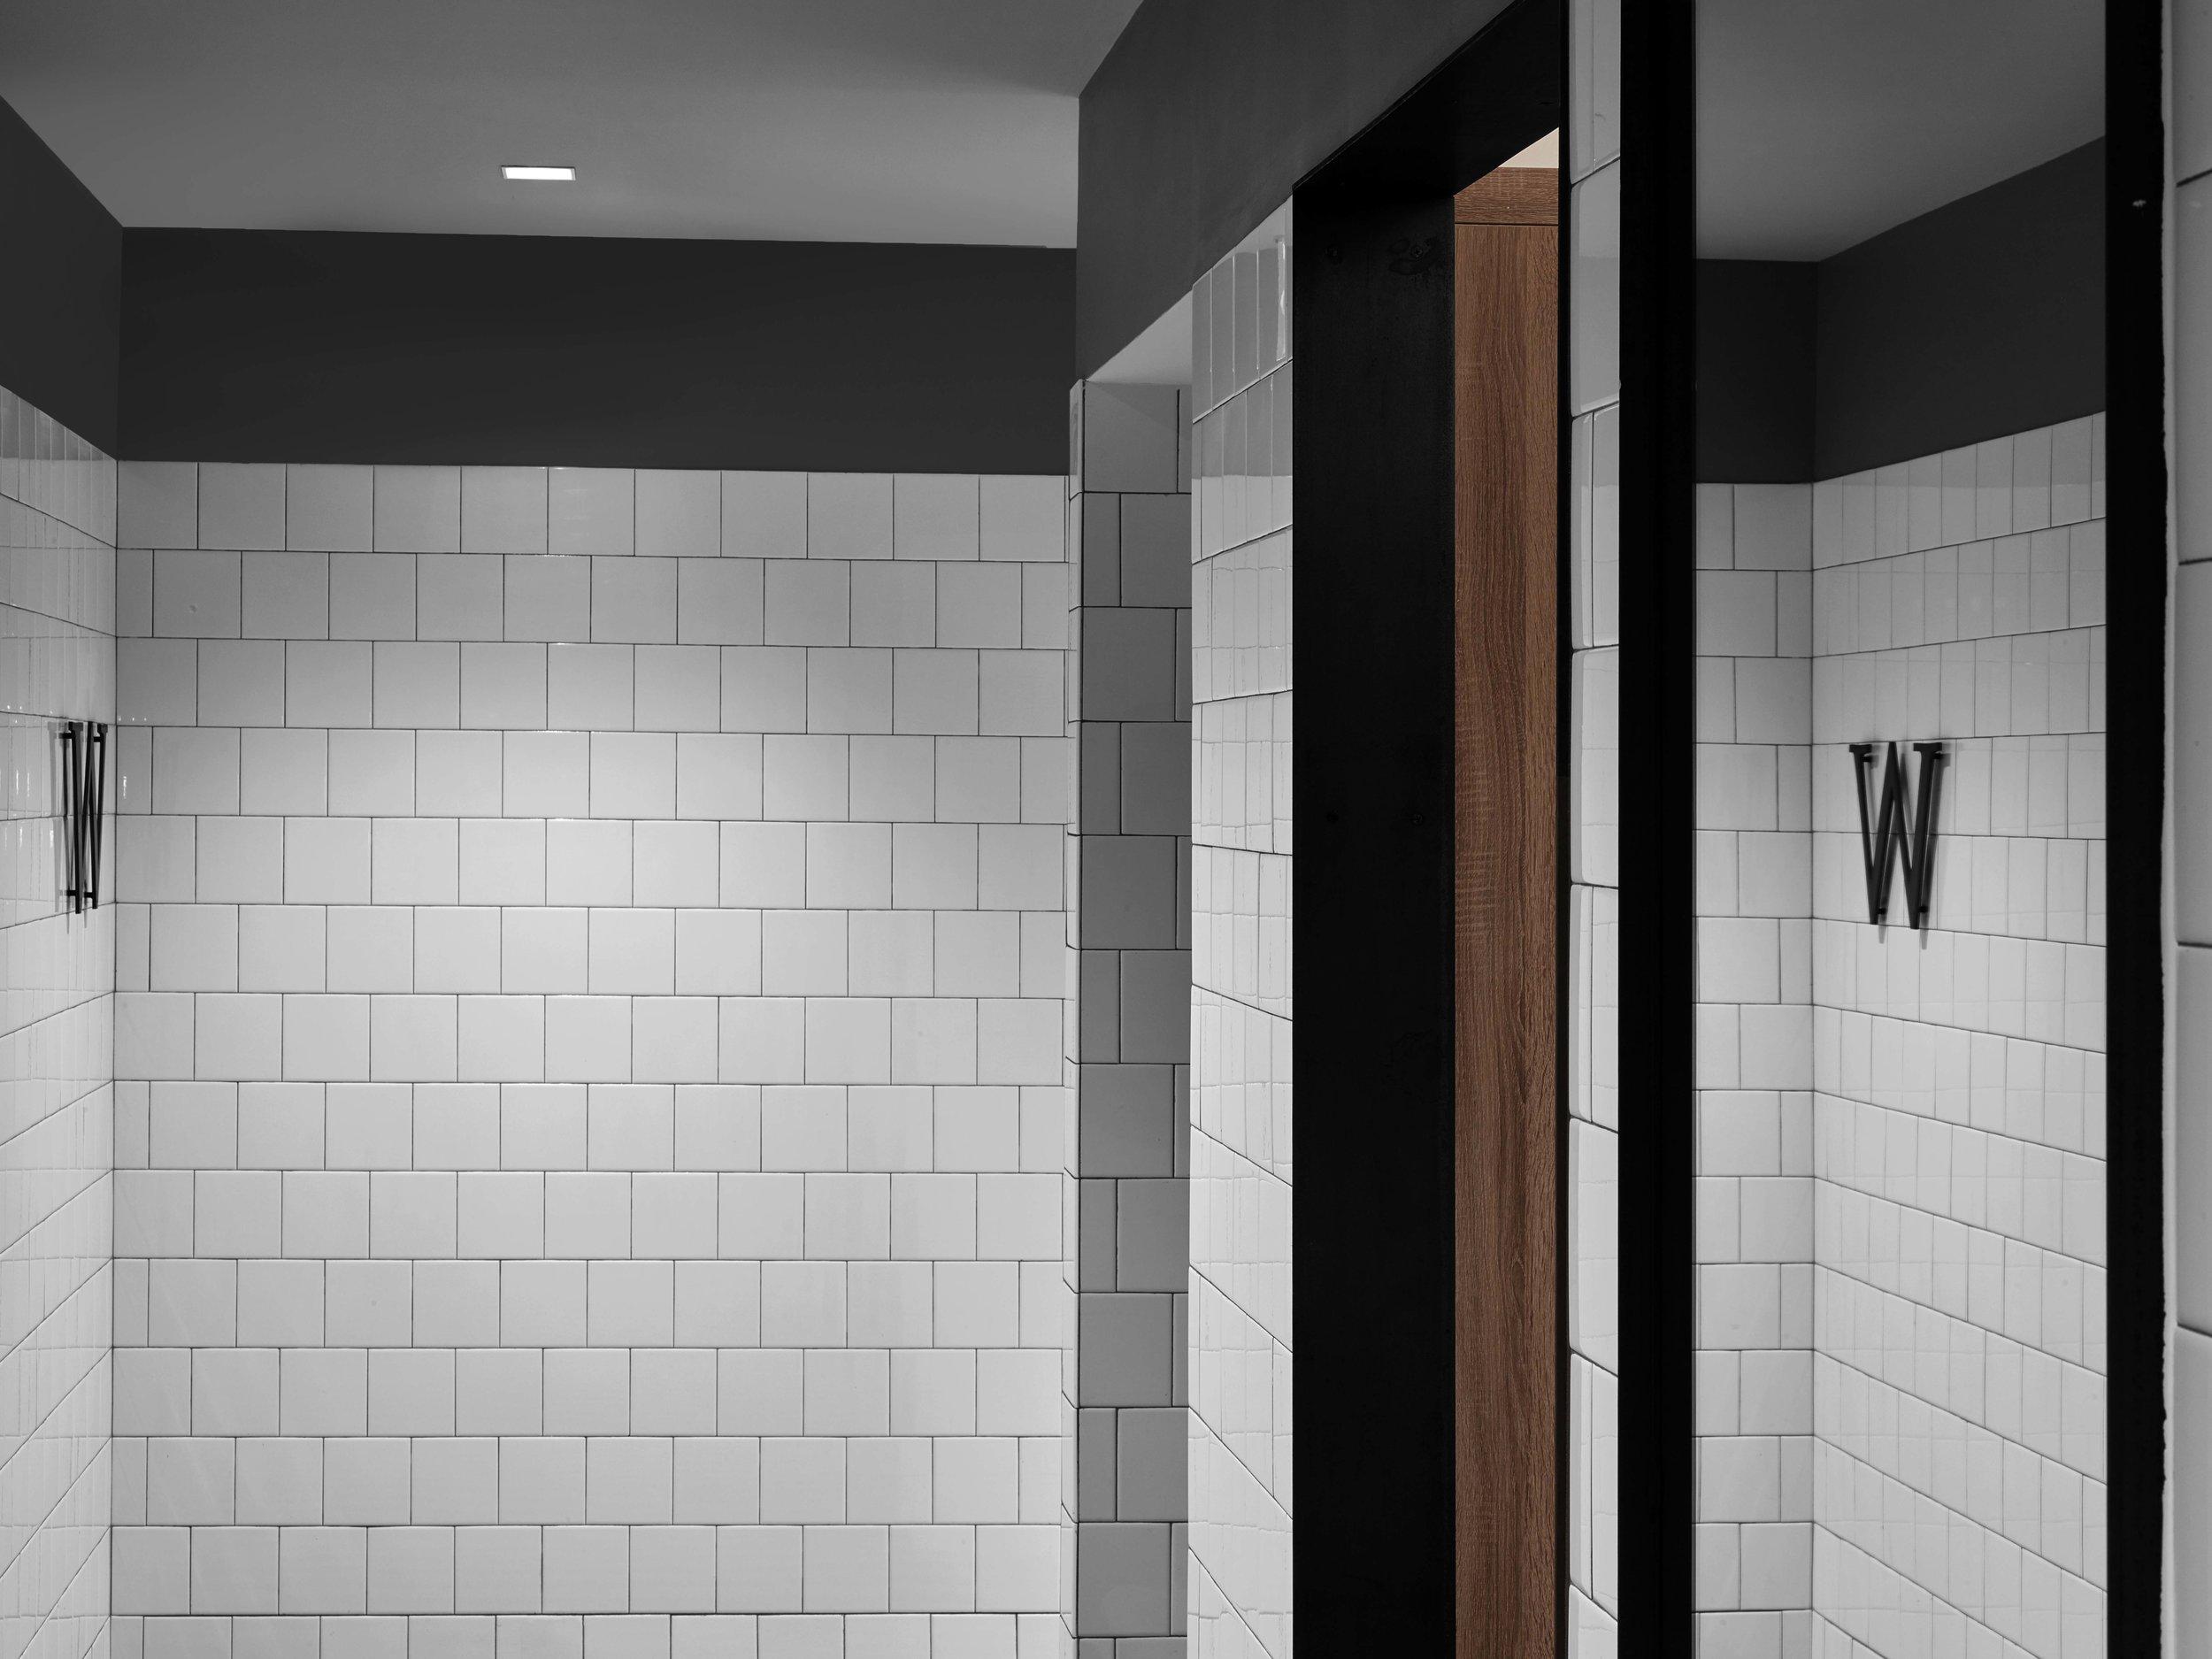 Industry City Athletic Club Women's Locker Room Entry